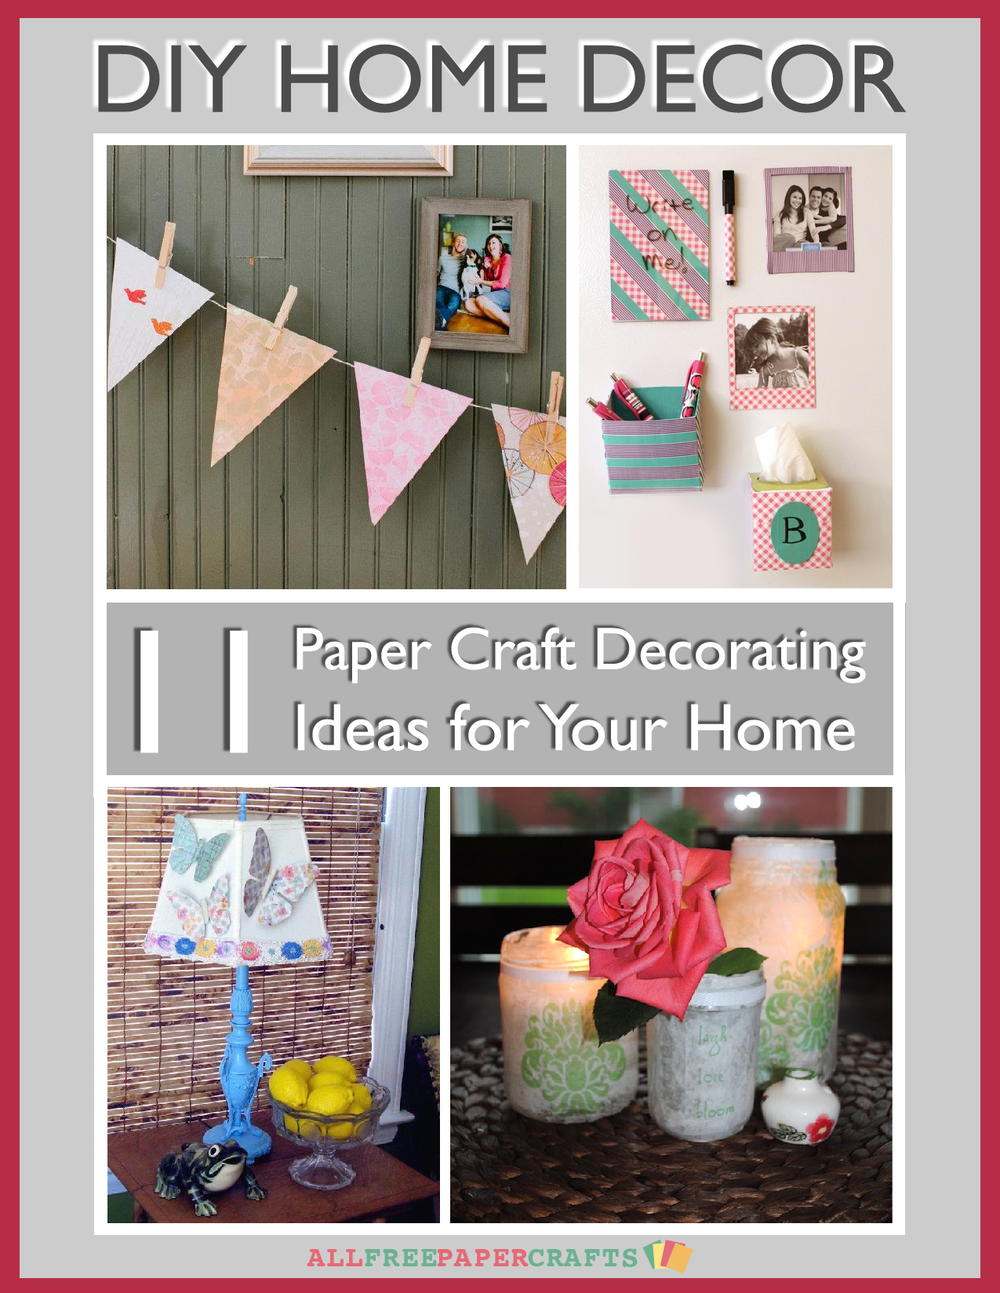 DIY Home Decor 11 Paper Craft Decorating